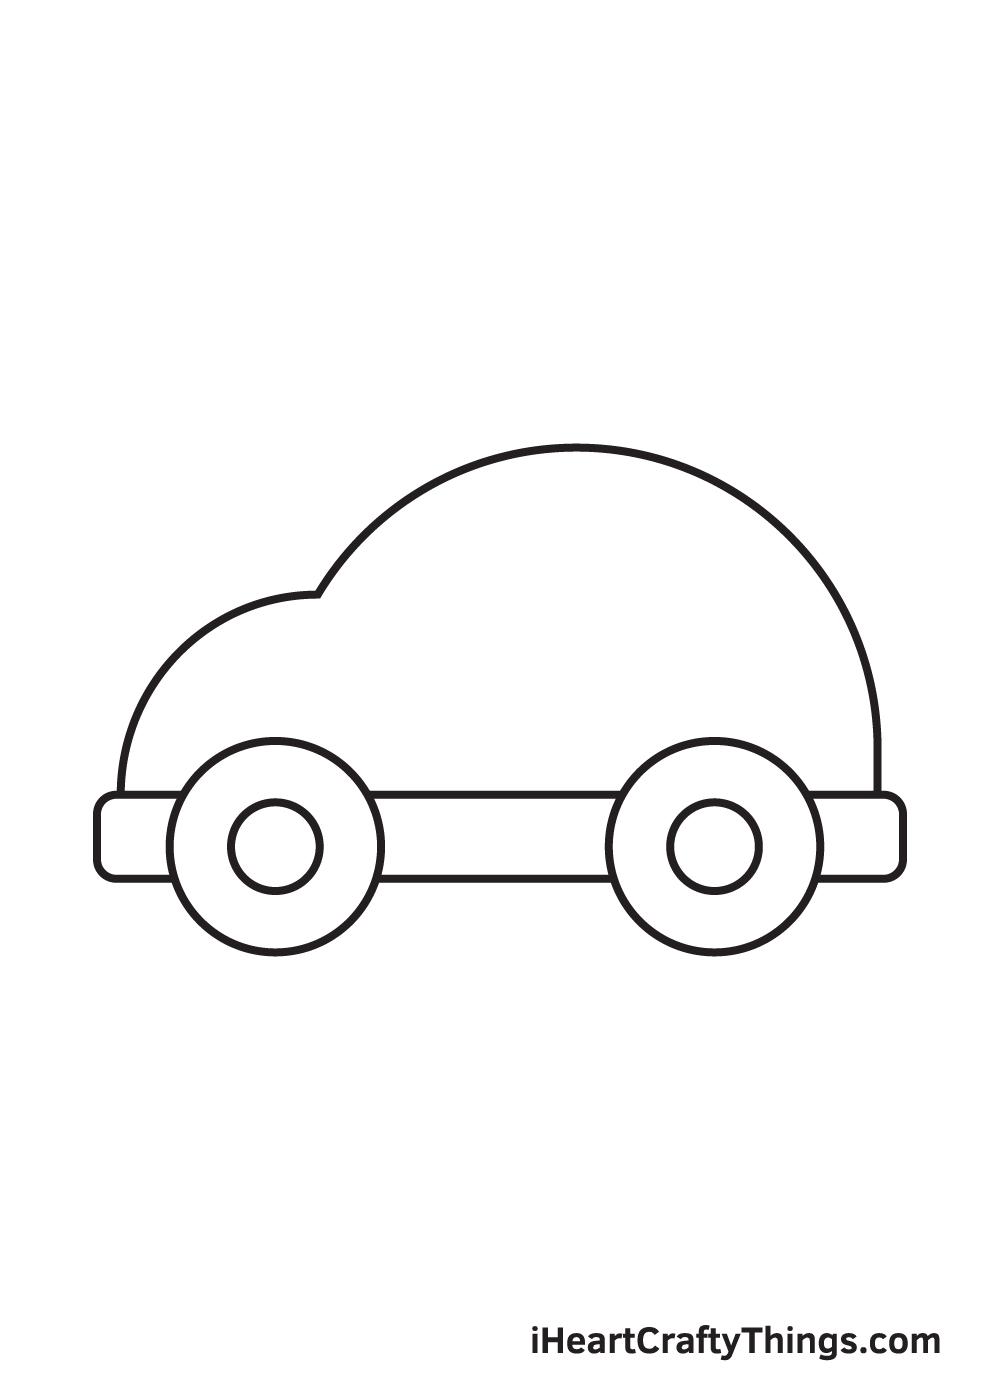 car drawing – step 4